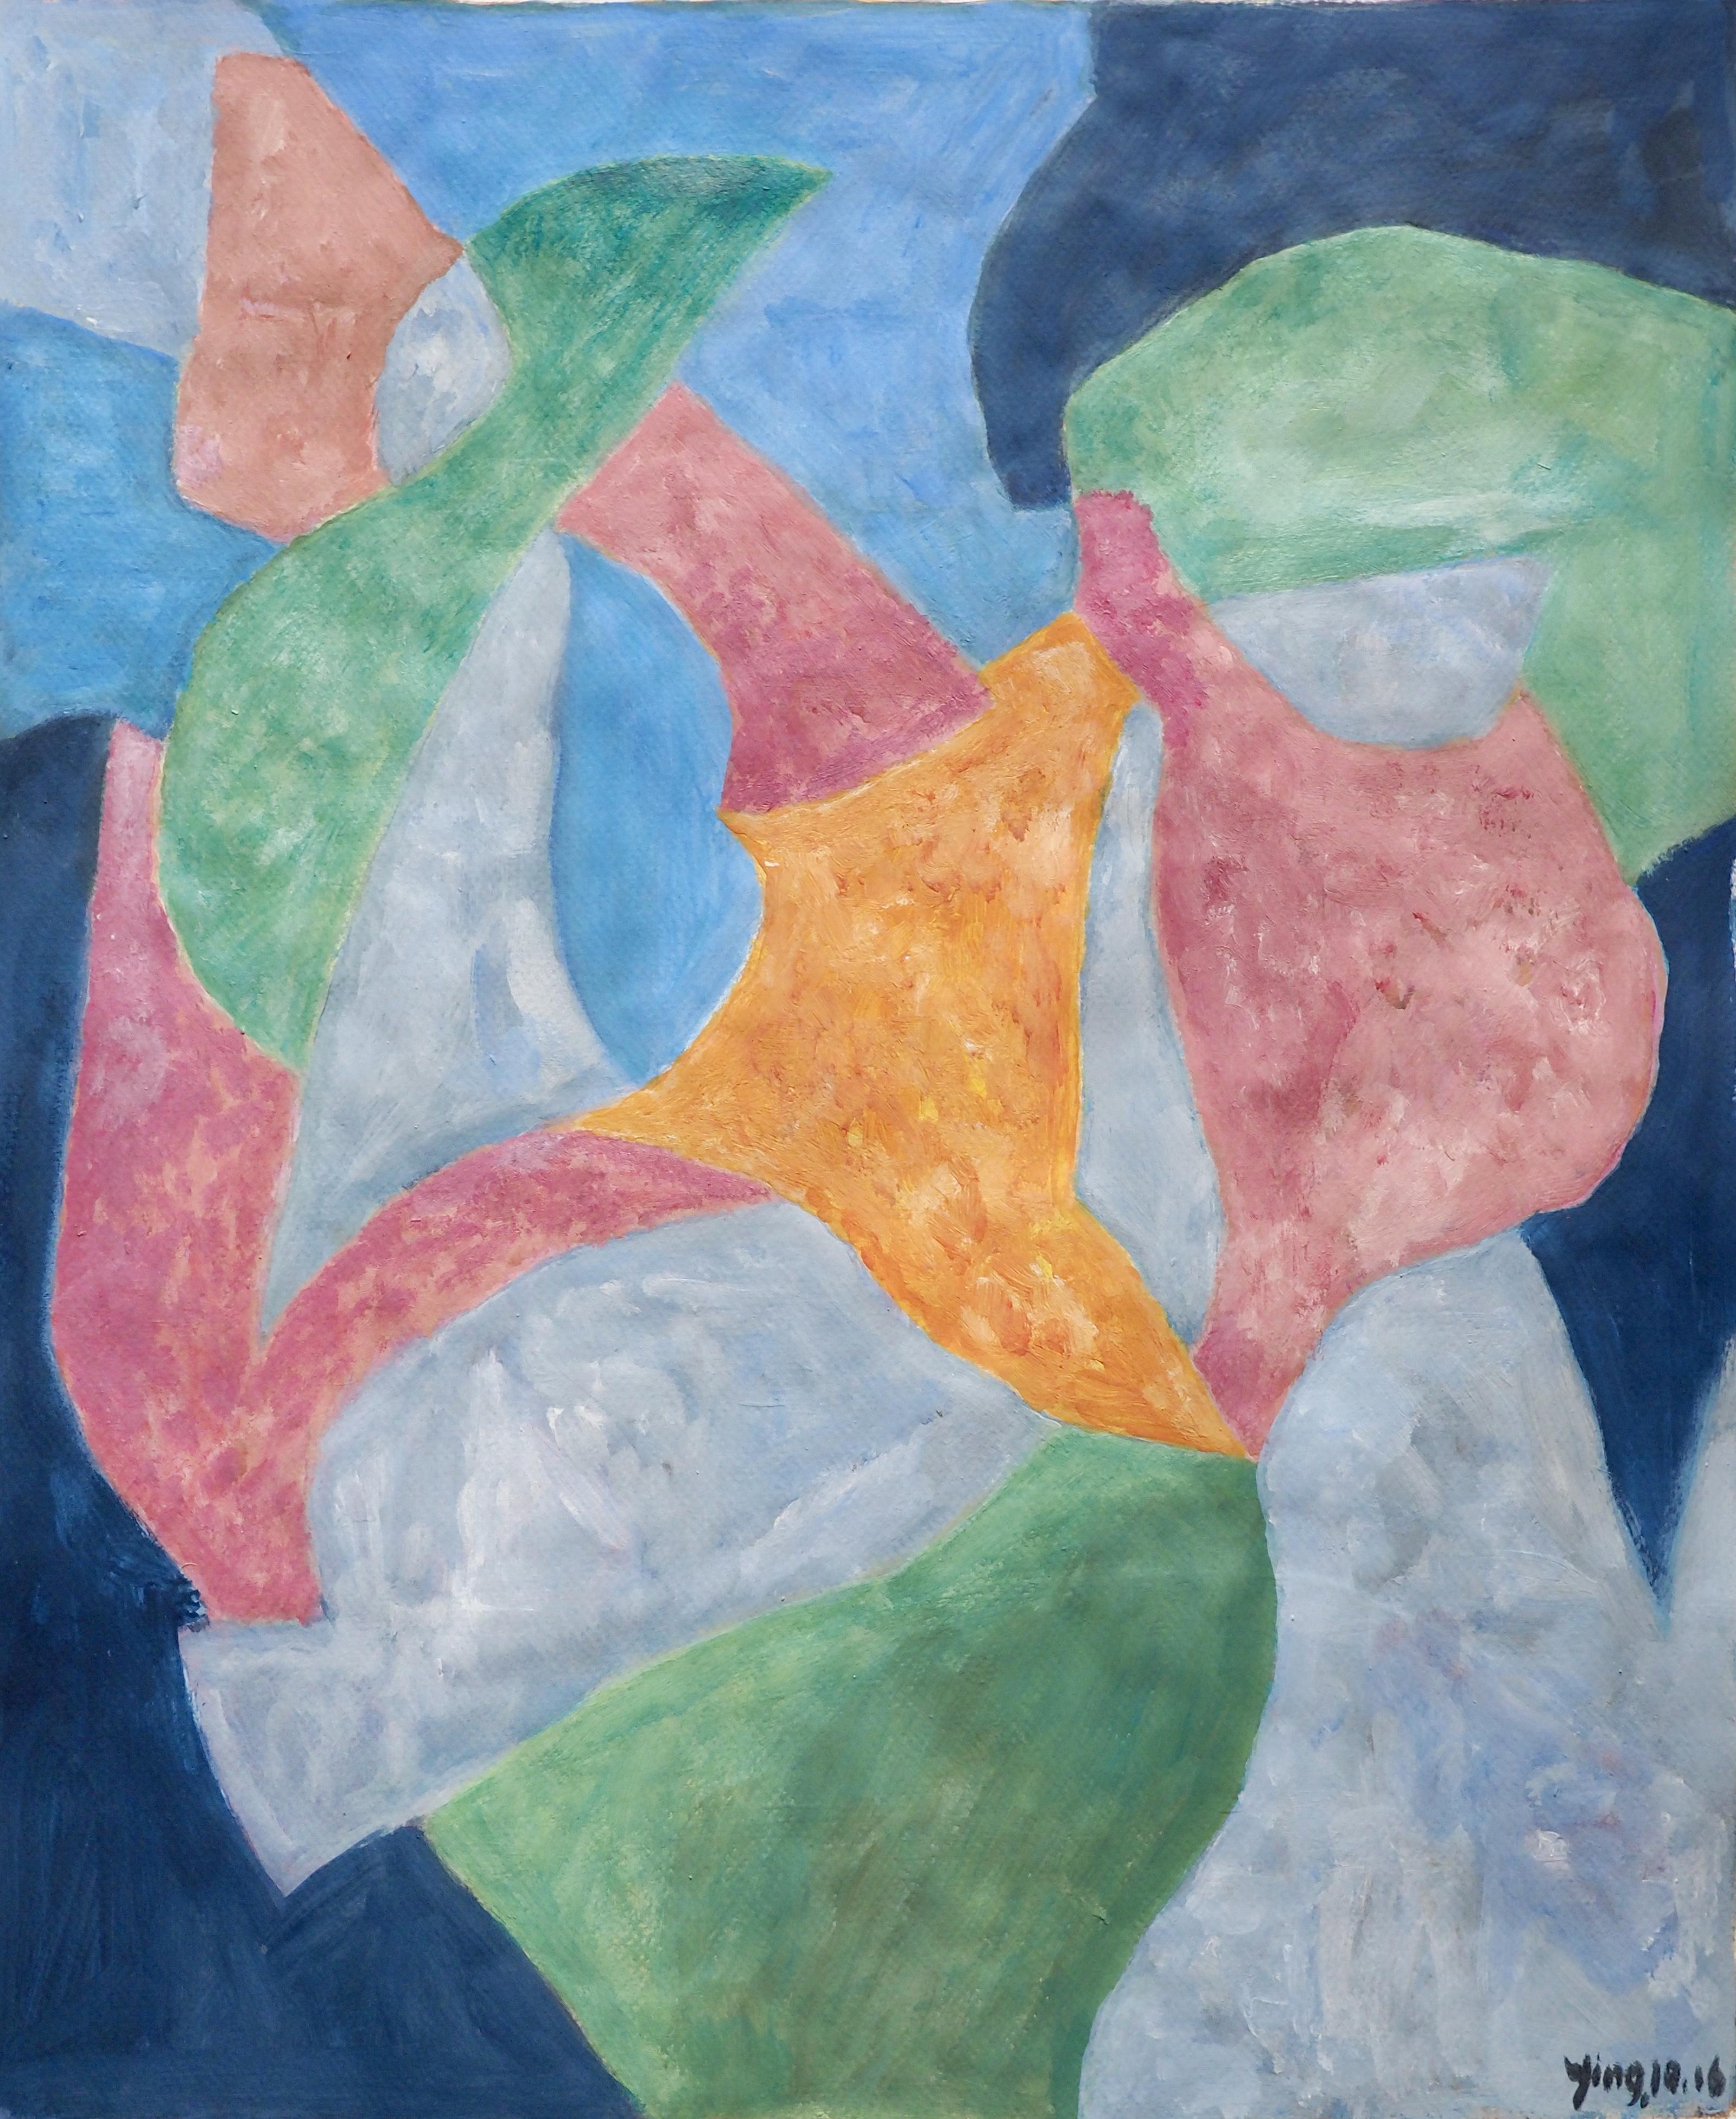 Chu Ying acrylique, 50x40